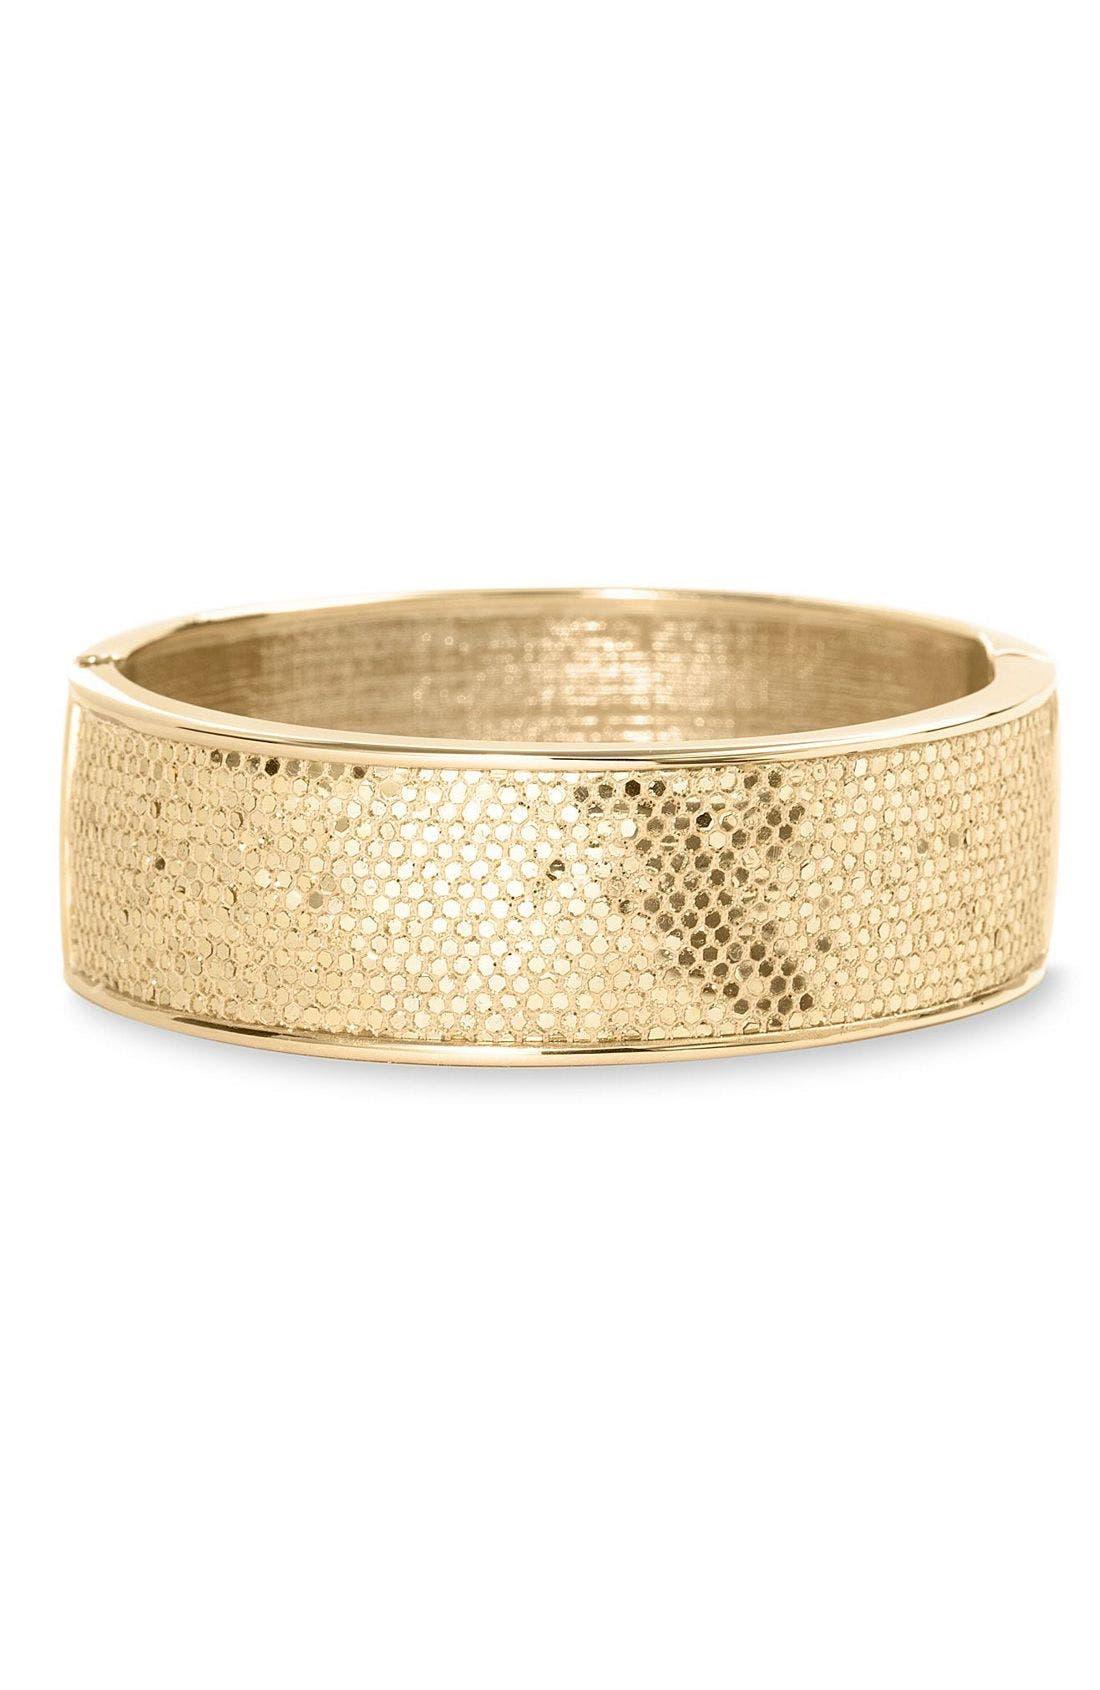 Alternate Image 1 Selected - Betsey Johnson Sequined Bangle Bracelet